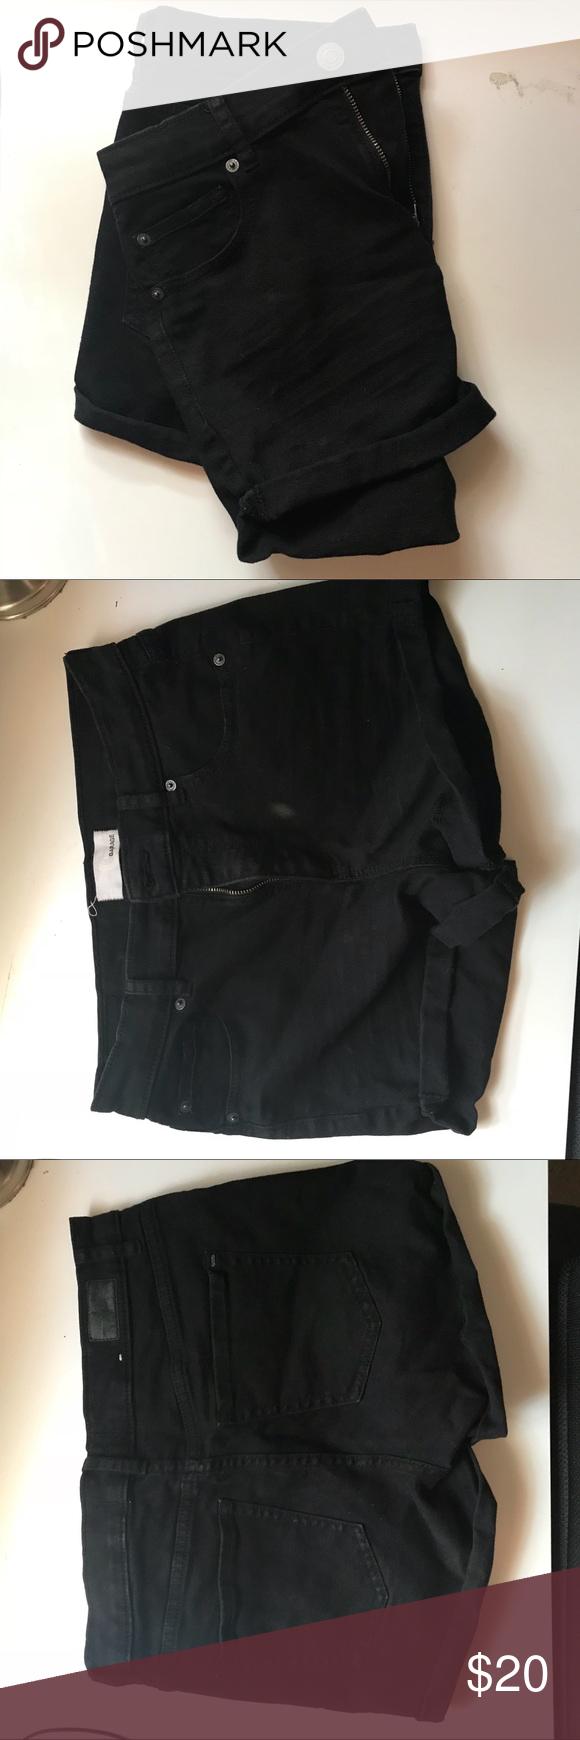 garage retro high waist black shorts retro high waist short style  black with no…